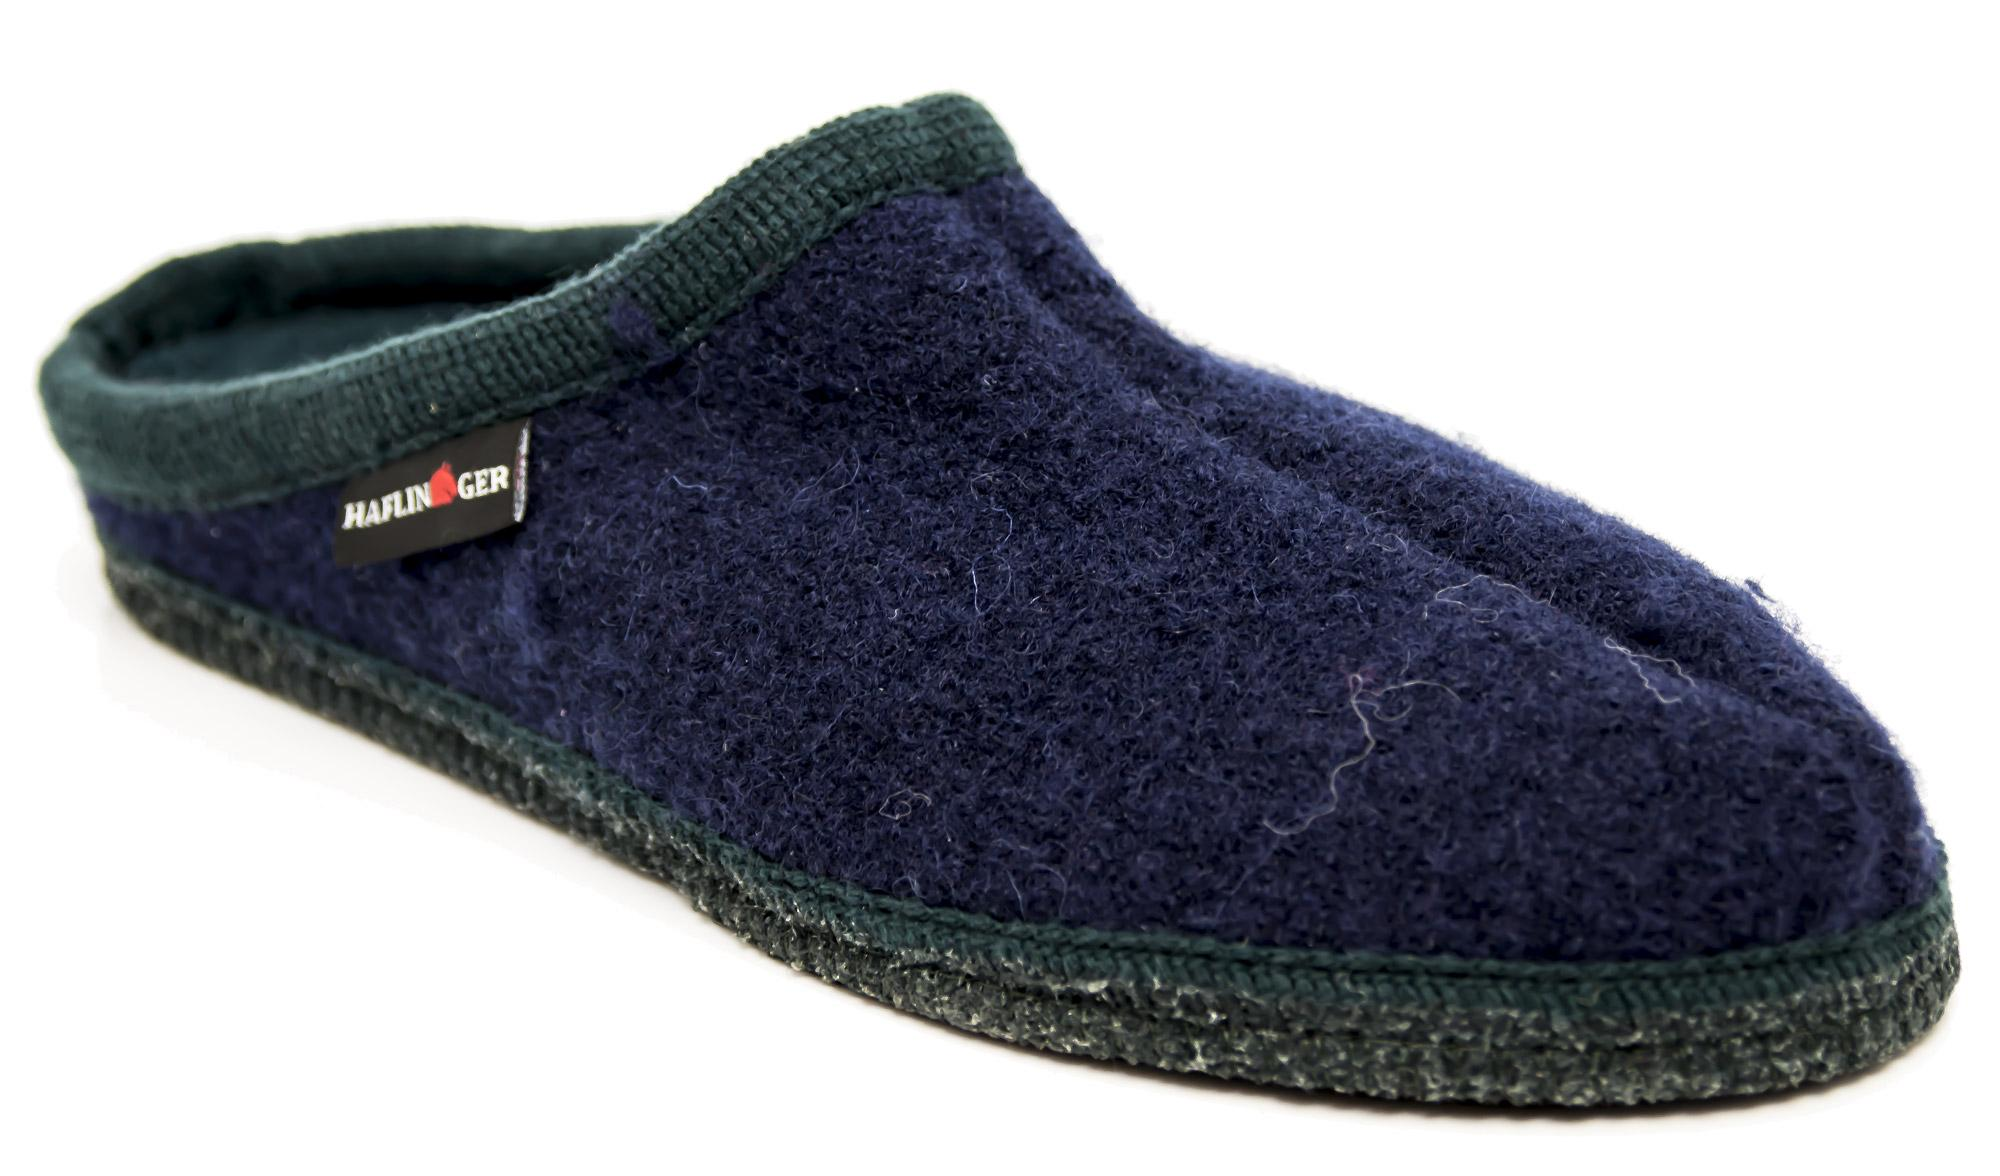 buy popular 98210 6259a Dettagli su Pantofole HAFLINGER Alaska-Jacquar 611001500 in lana cotta